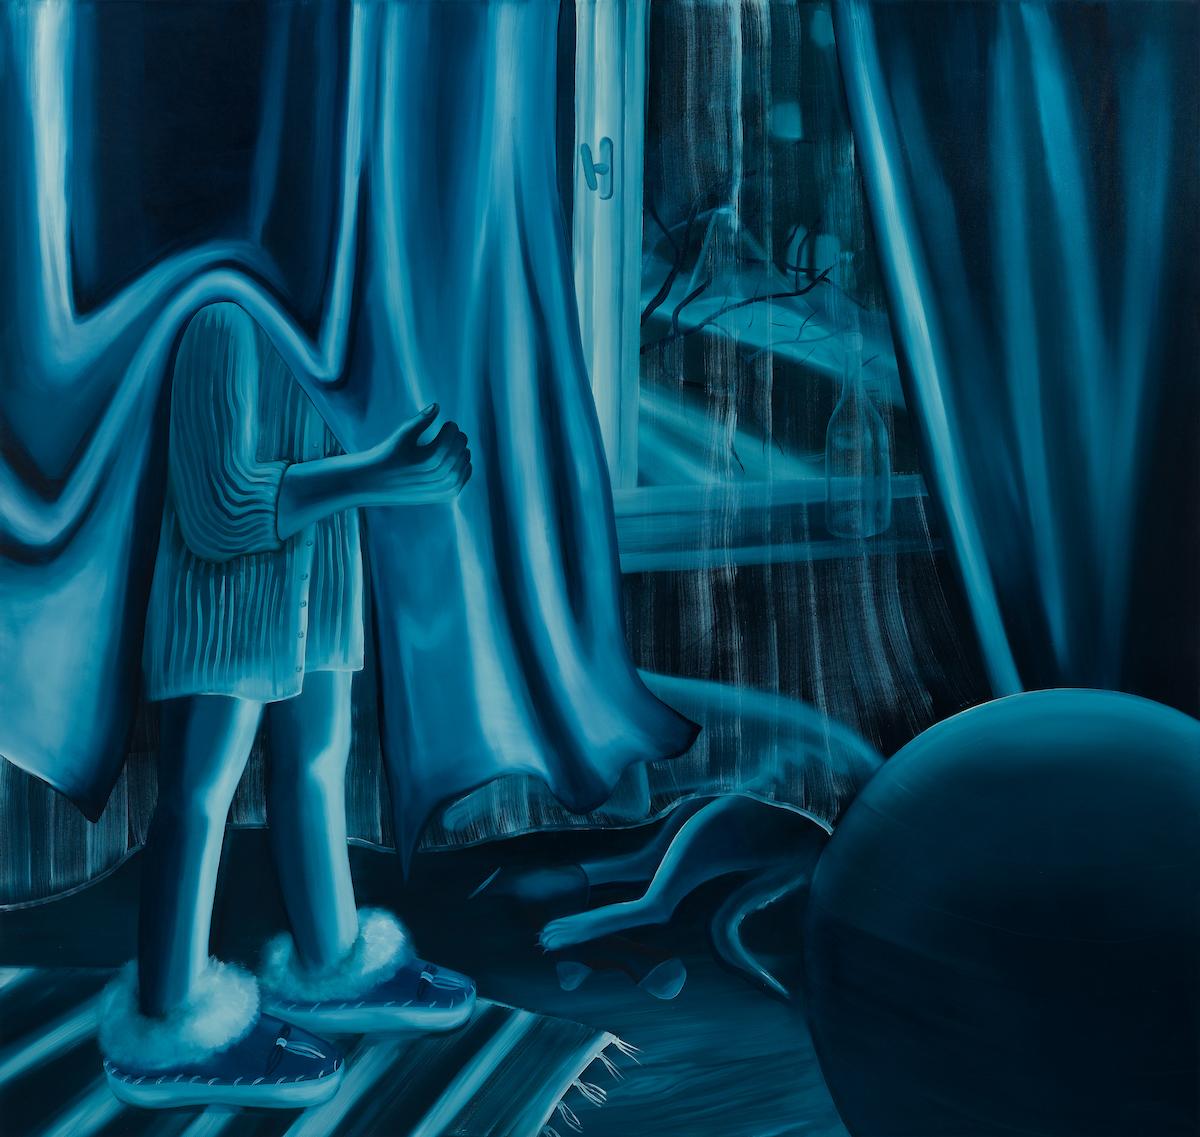 Karolina Jabłońska.<em>Looking out the Window (blue)</em>, 2020. Oil on canvas, 70 7/8 x 74 7/8 inches (180 x 190.2 cm)